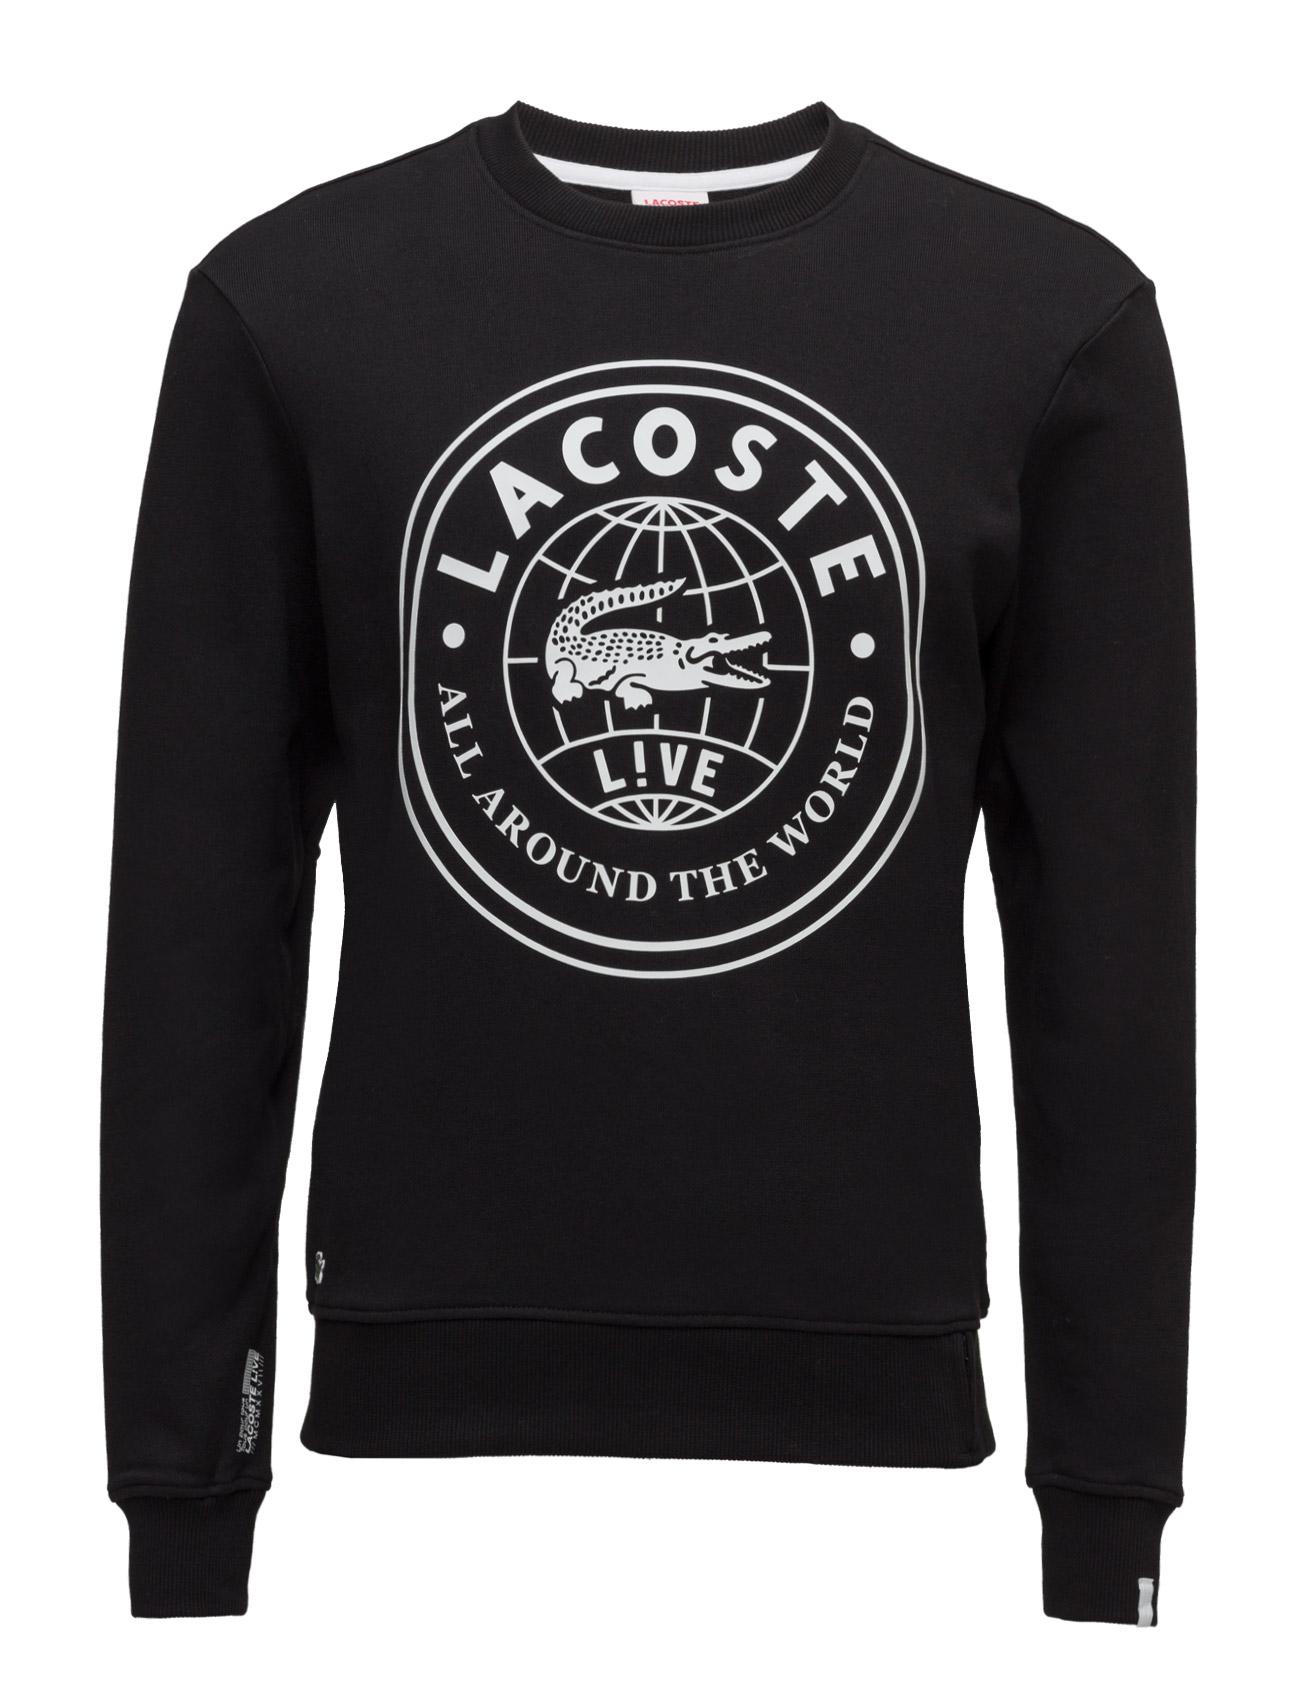 lacoste live – Sweatshirts på boozt.com dk